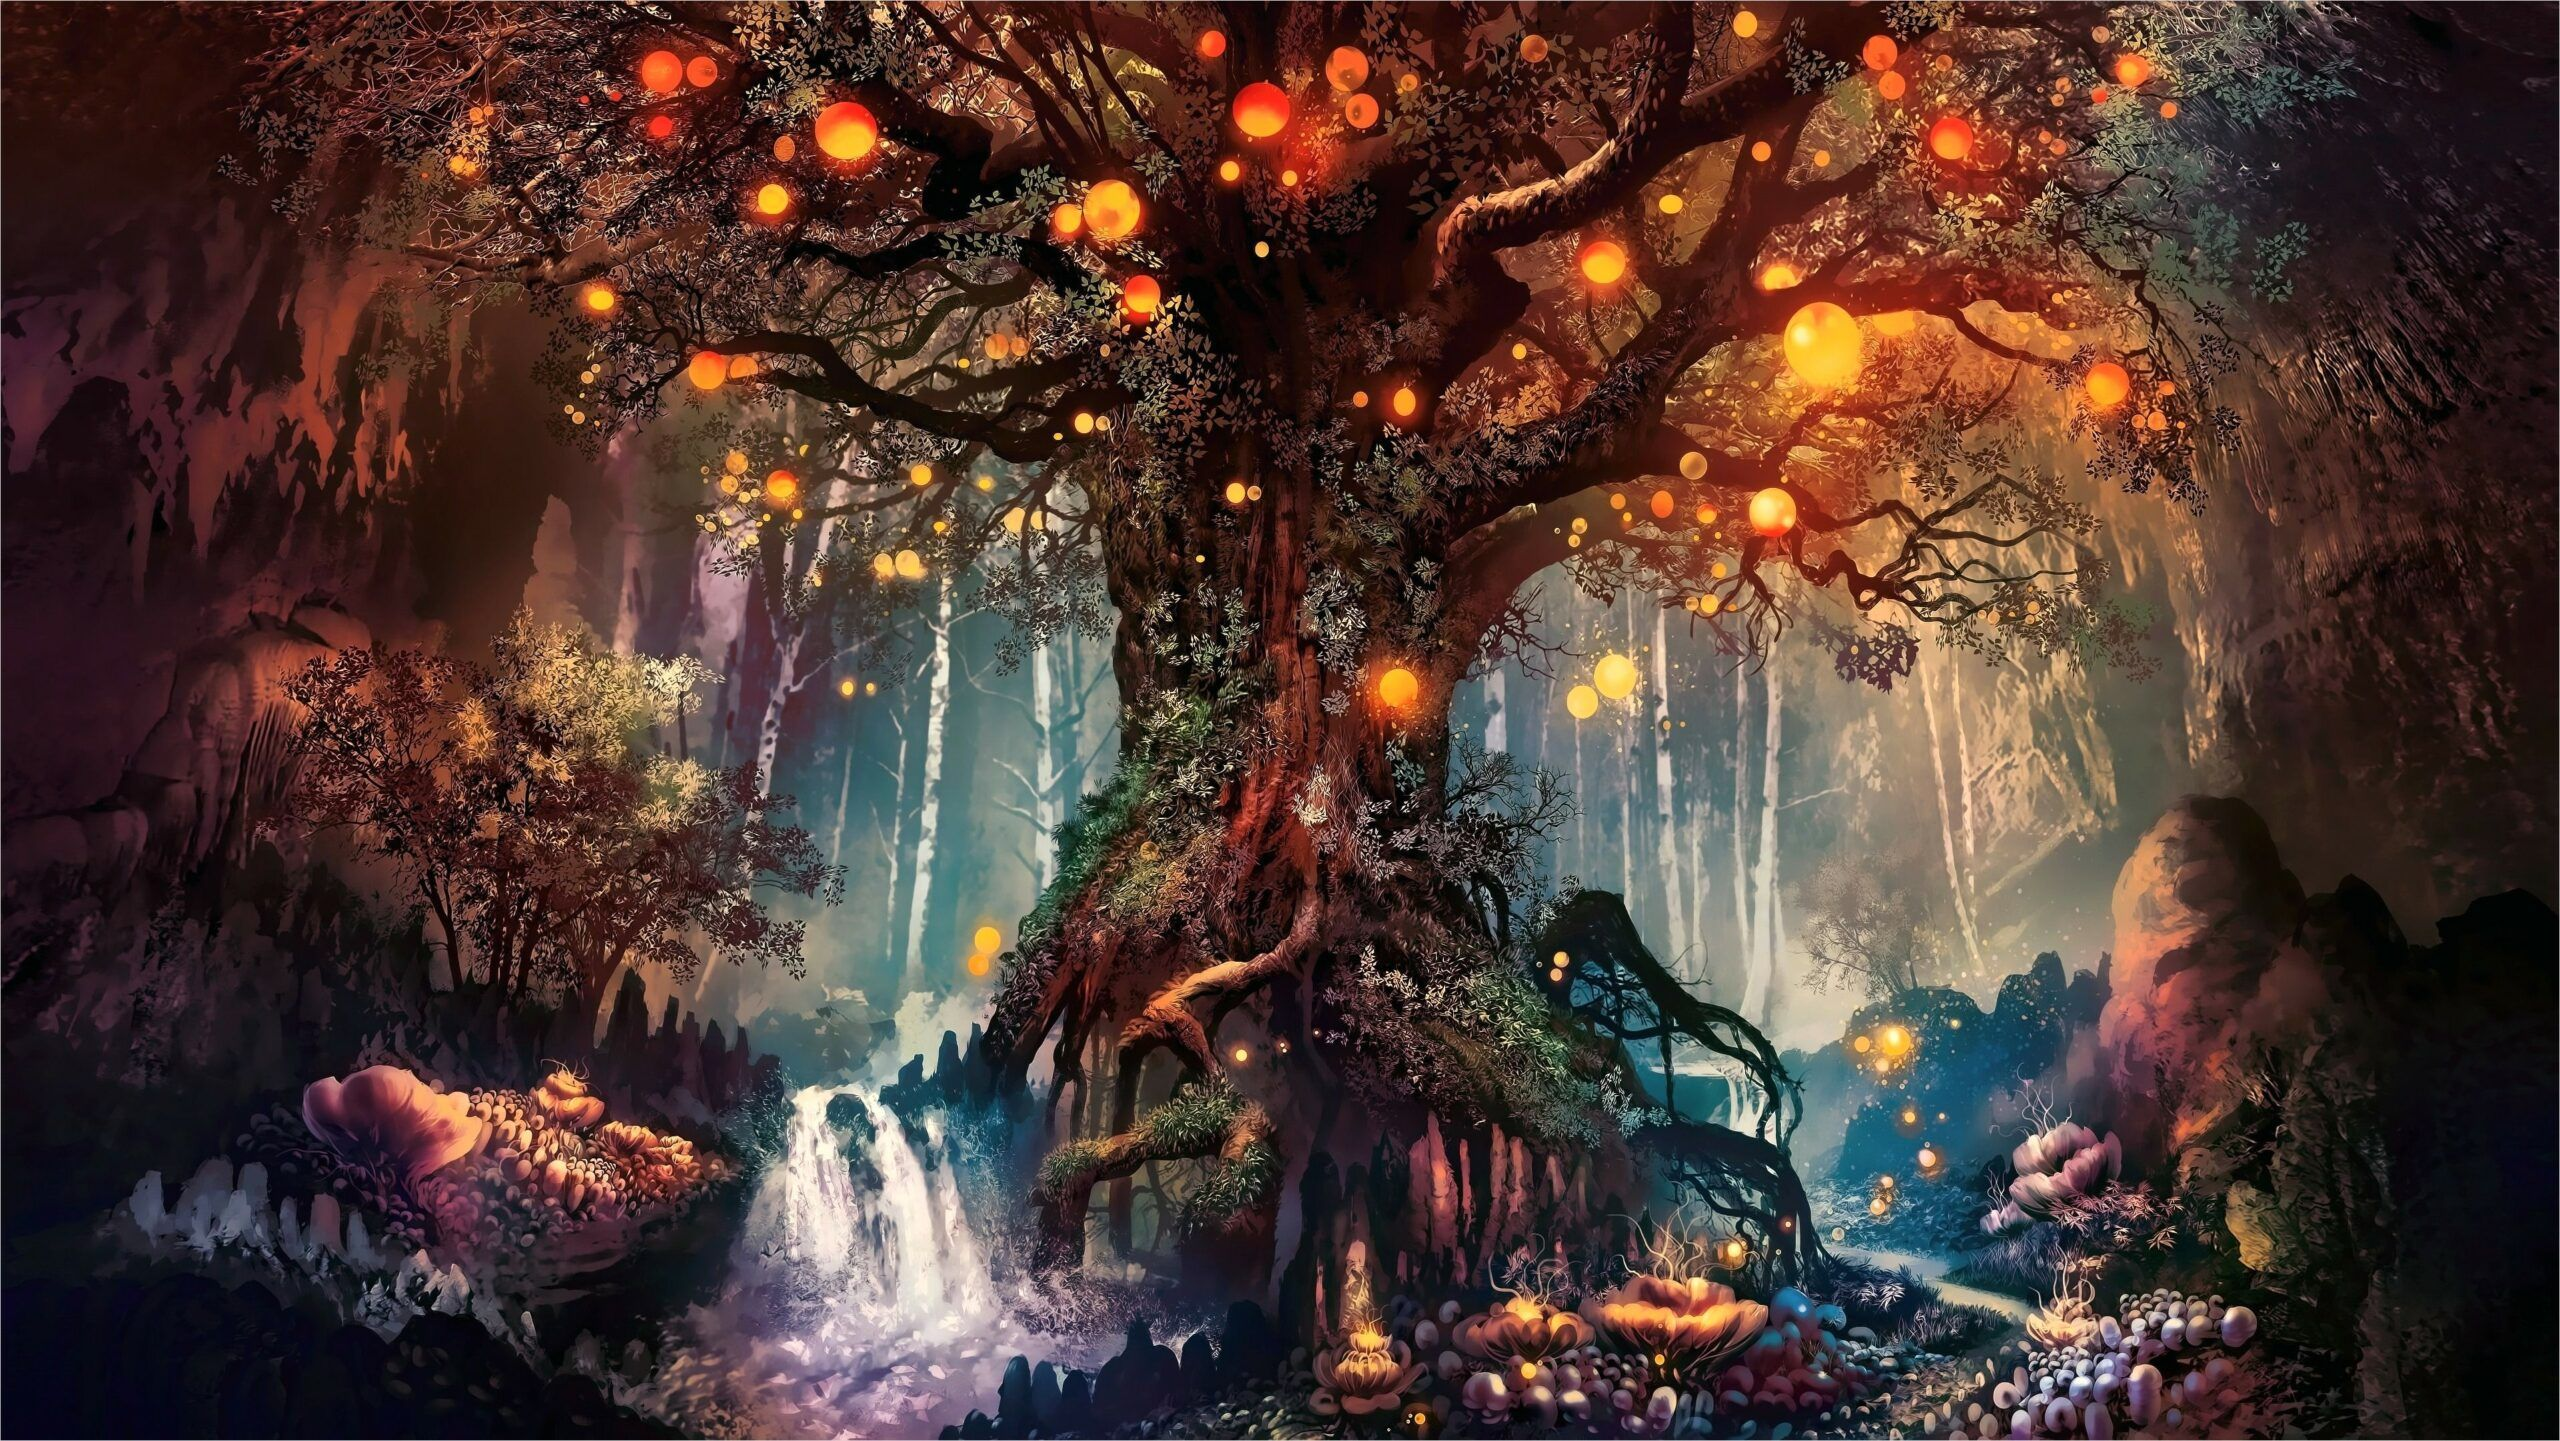 4k 16 9 Wallpaper In 2020 Fantasy Artwork Tree Art Artwork